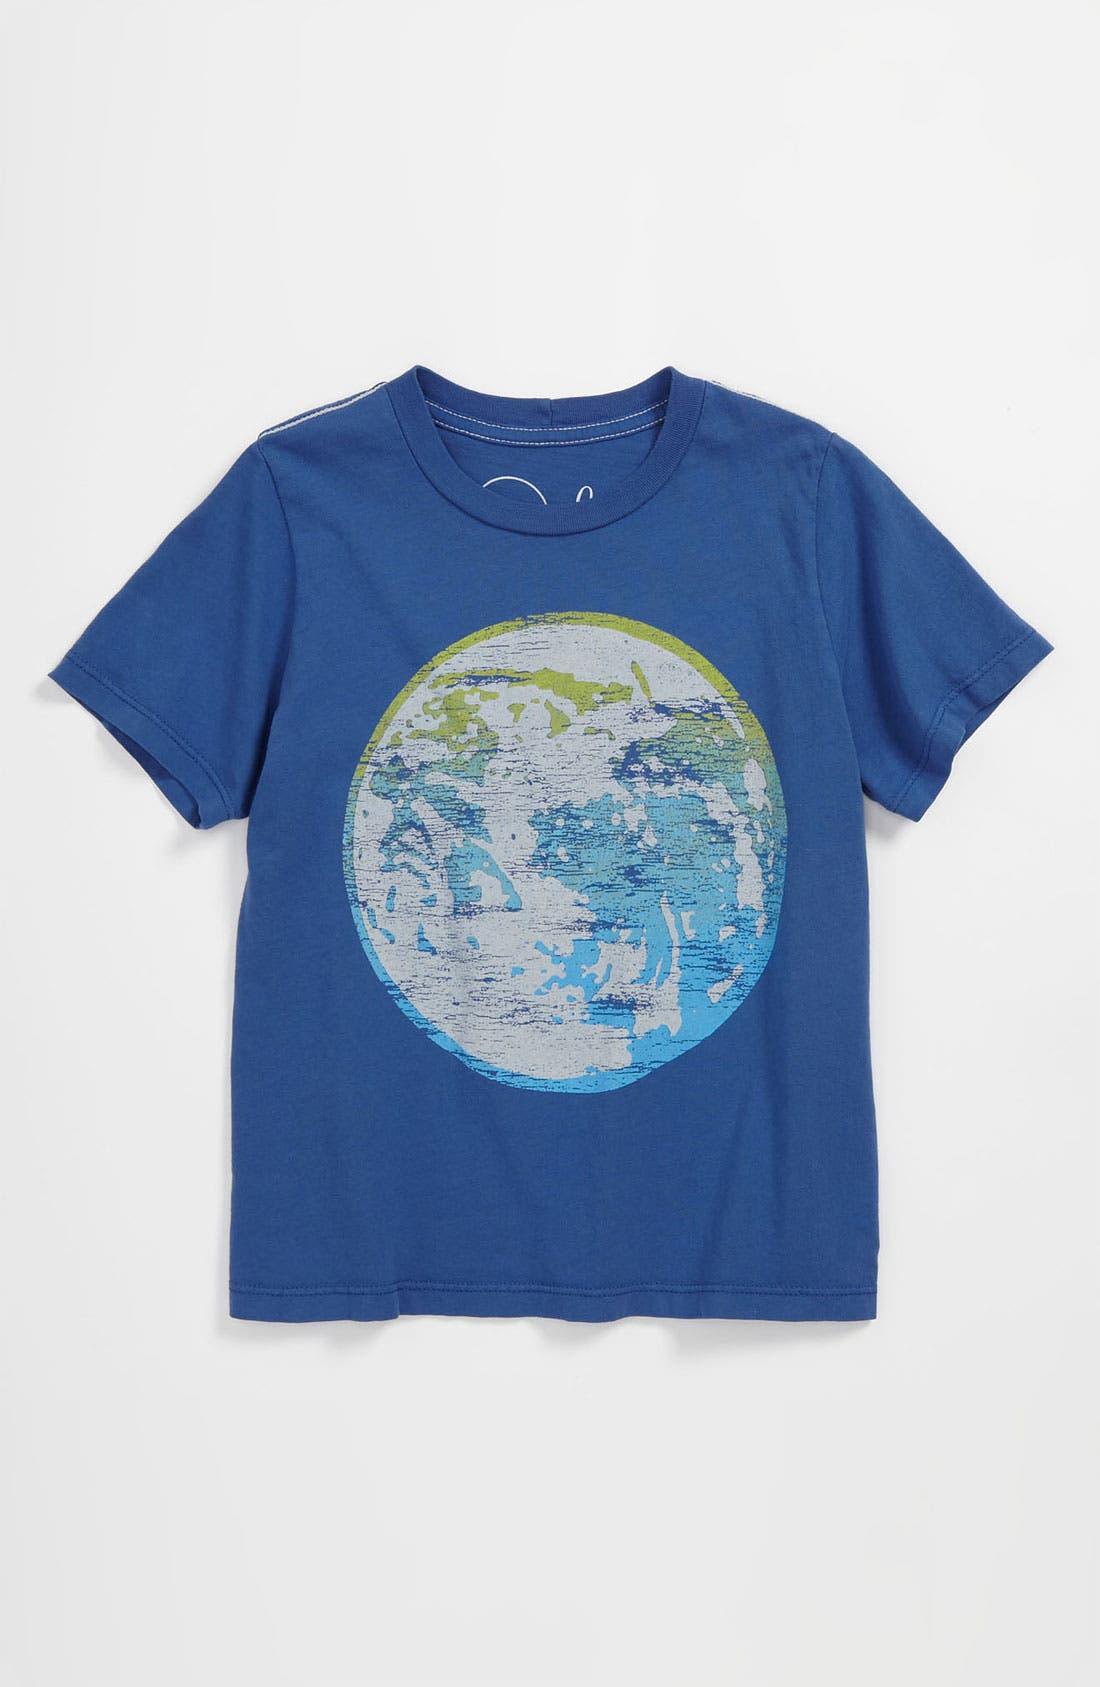 Main Image - Peek 'Respect Your Mother' T-Shirt (Toddler, Little Boys & Big Boys)